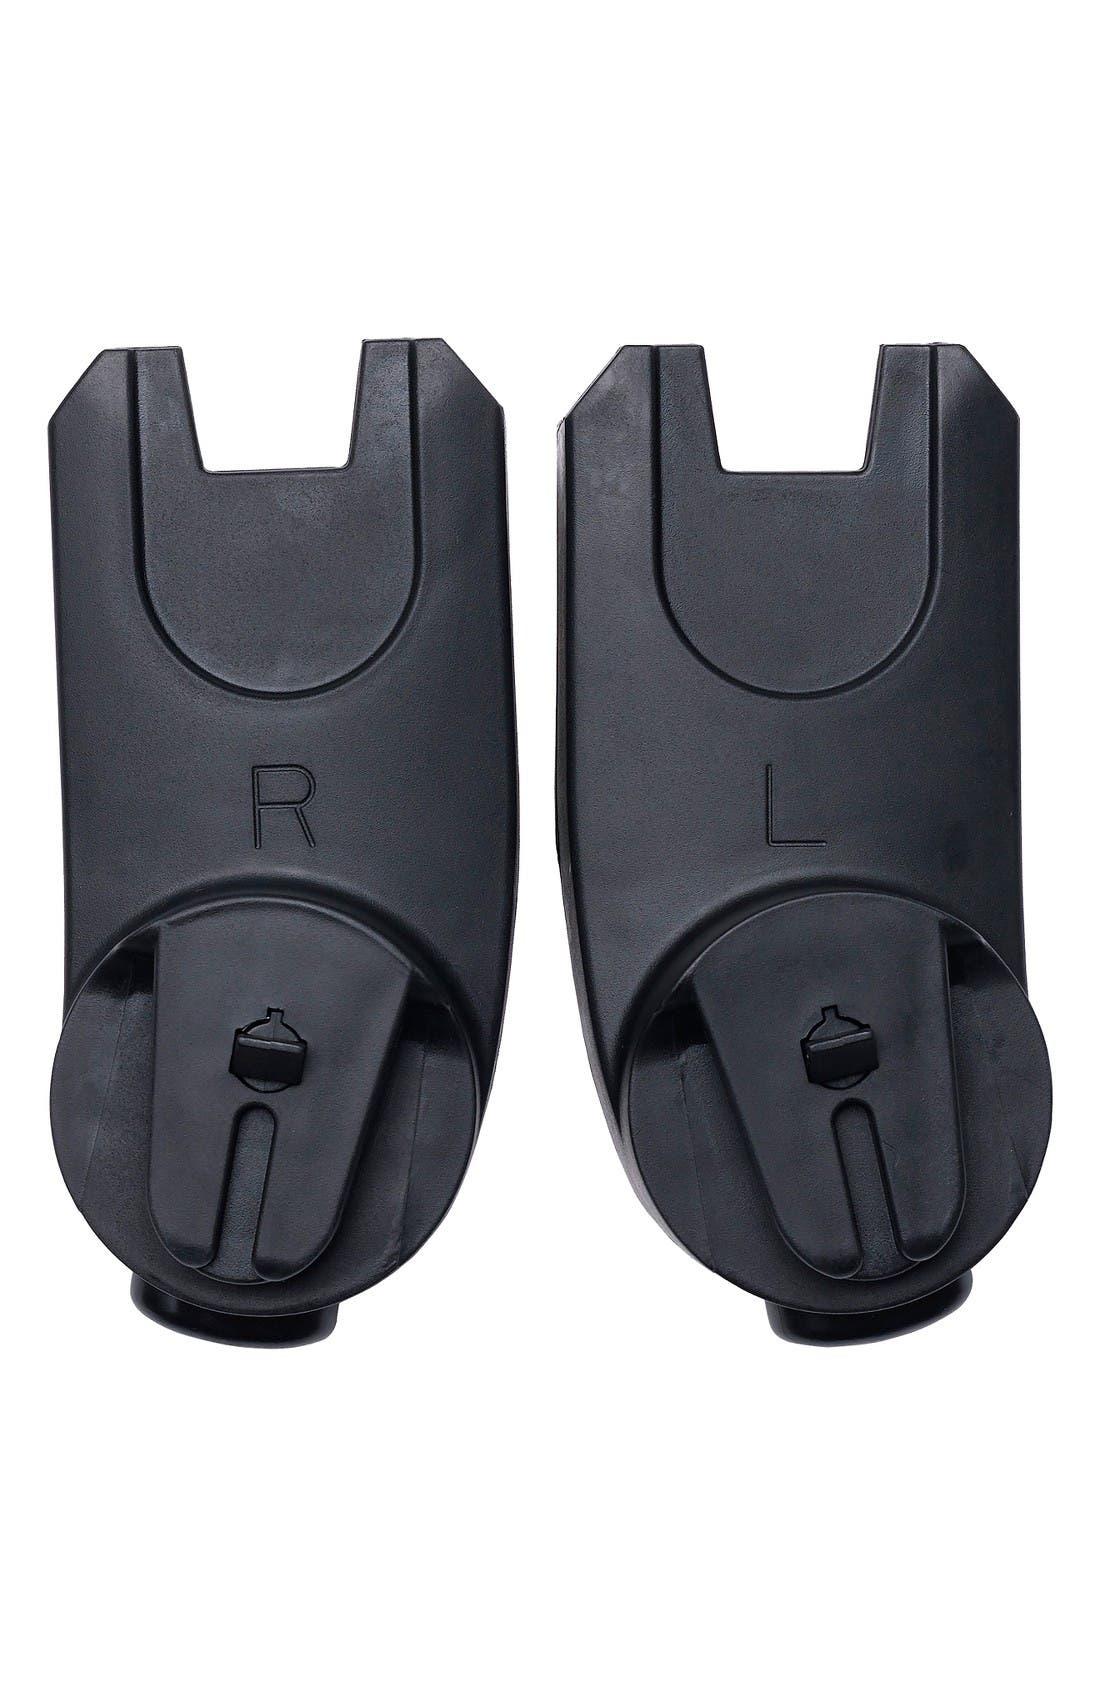 Car Seat Adaptor for Mima Xari Stroller and Maxi Cosi, Cybex & Nuna Car Seats,                             Main thumbnail 1, color,                             BLACK